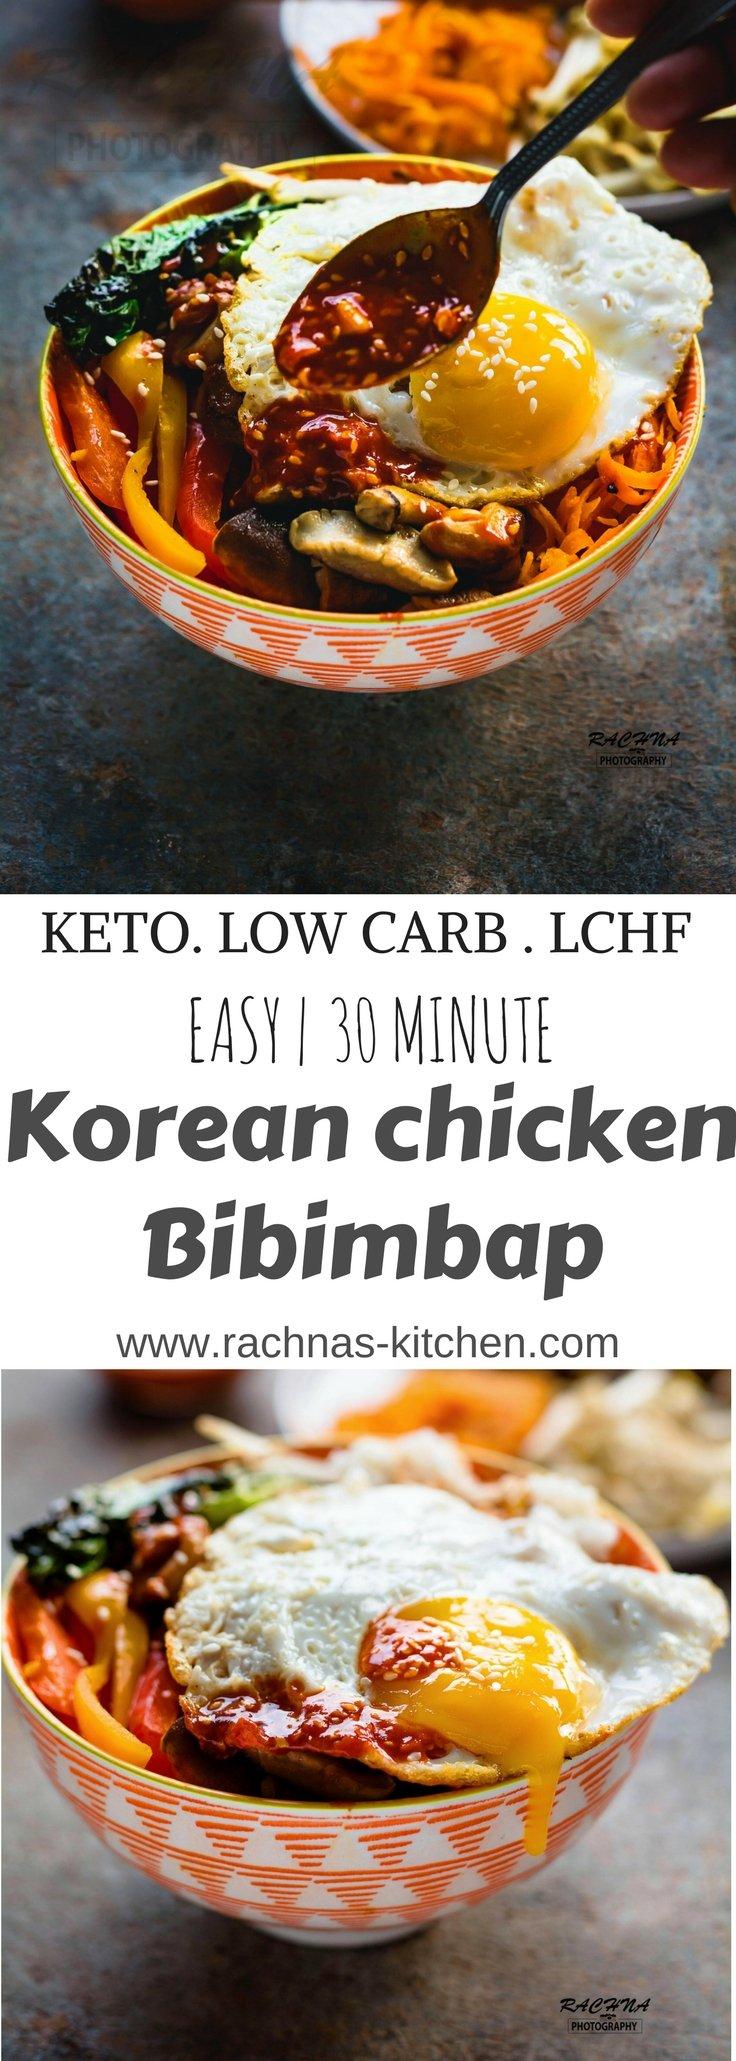 Korean chicken bibimbap pin